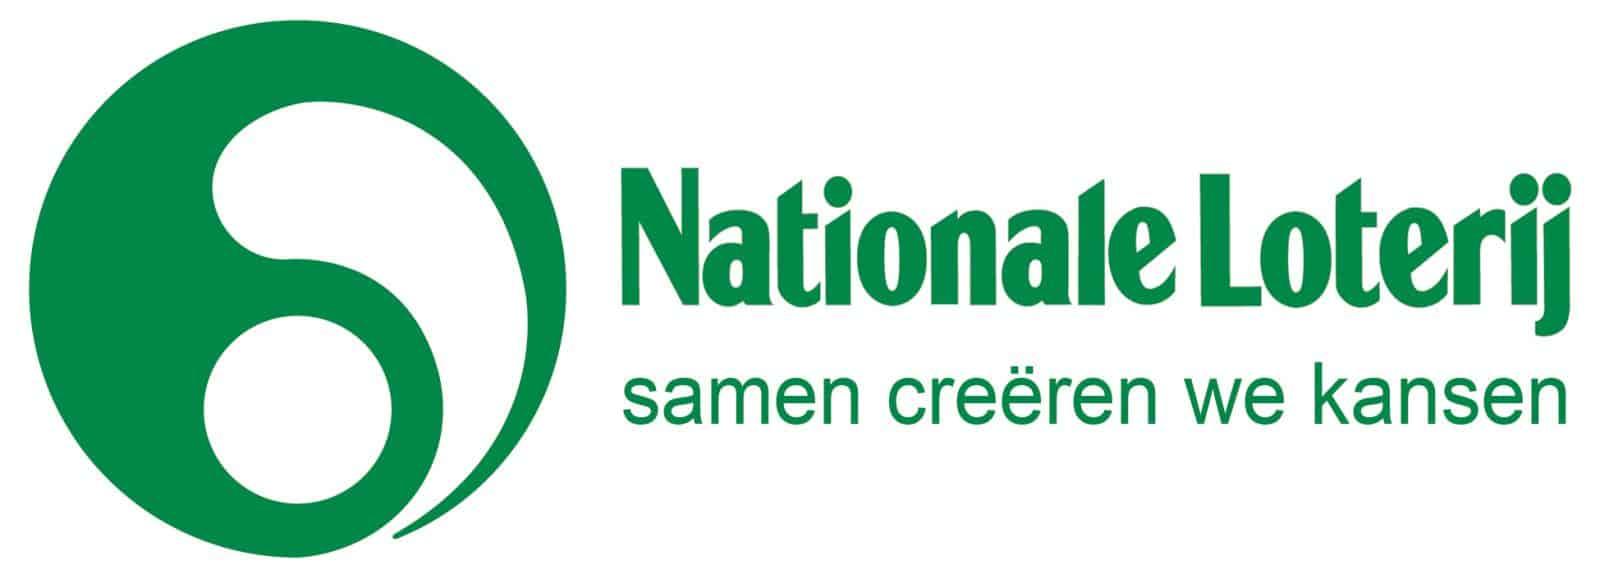 logo-Nationale-Loterij